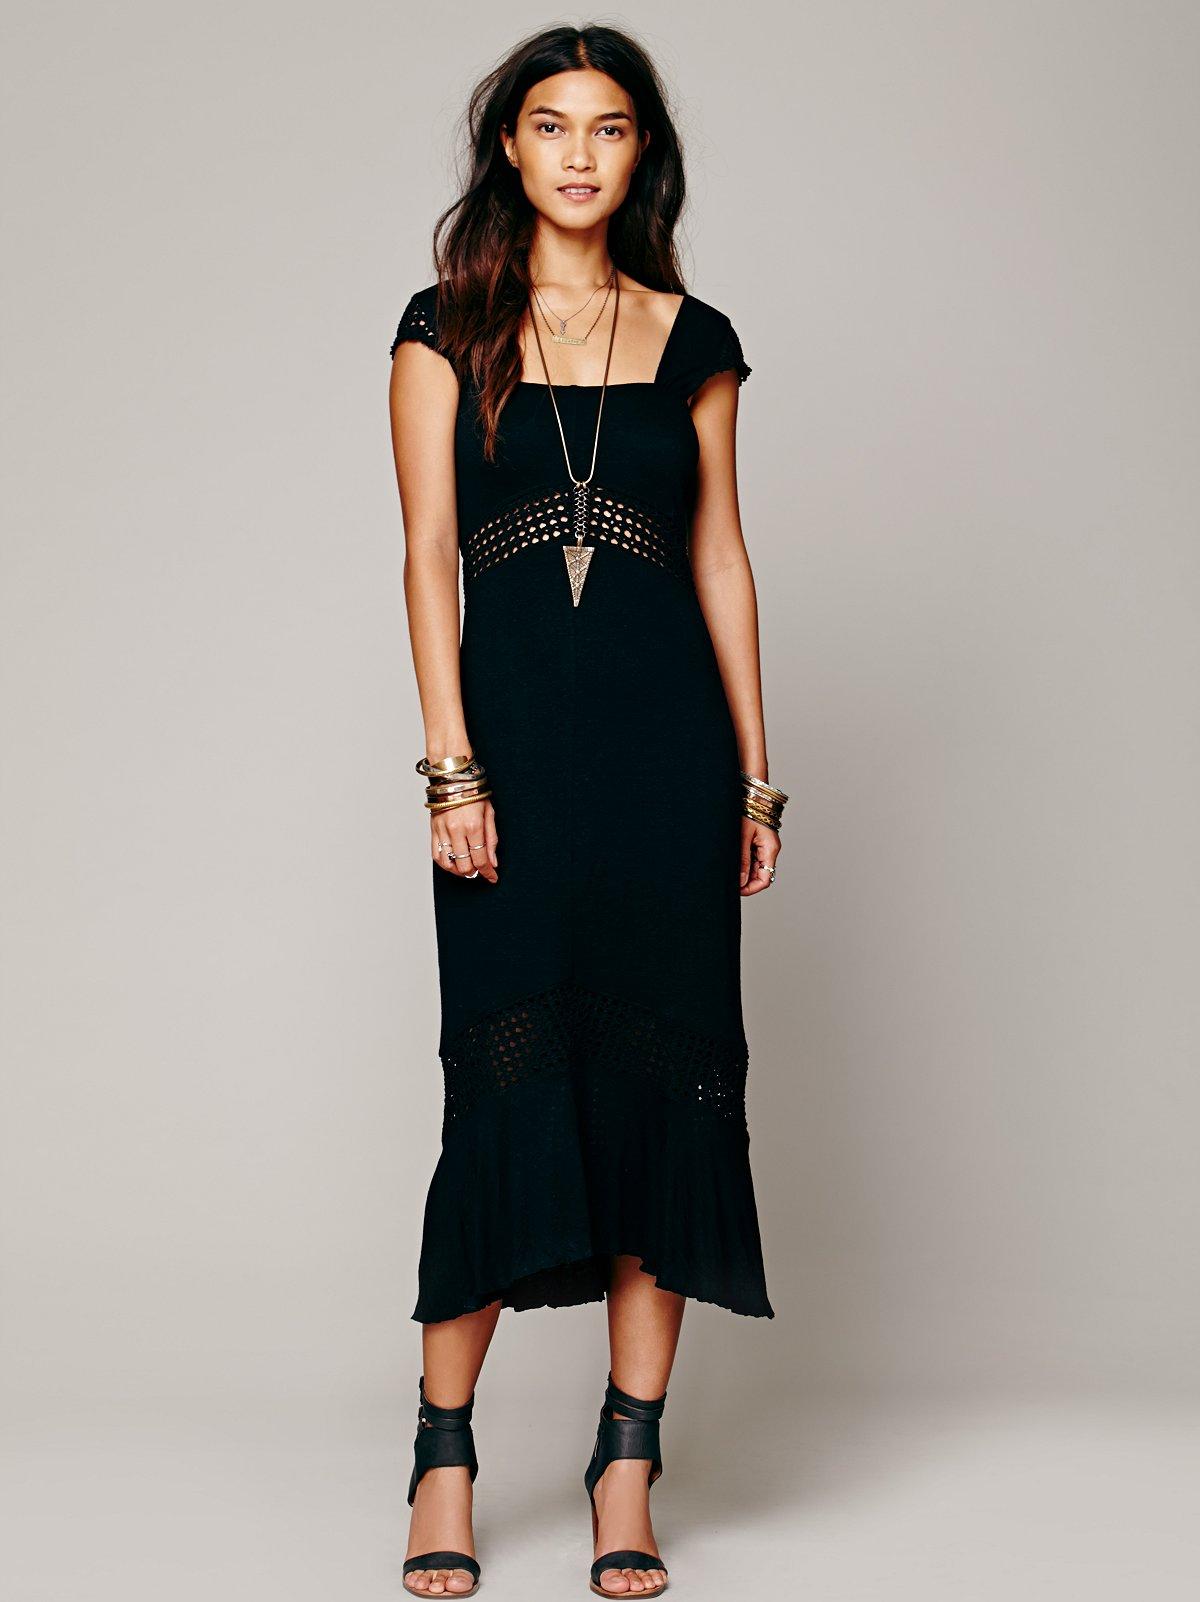 Leighabelle Dress